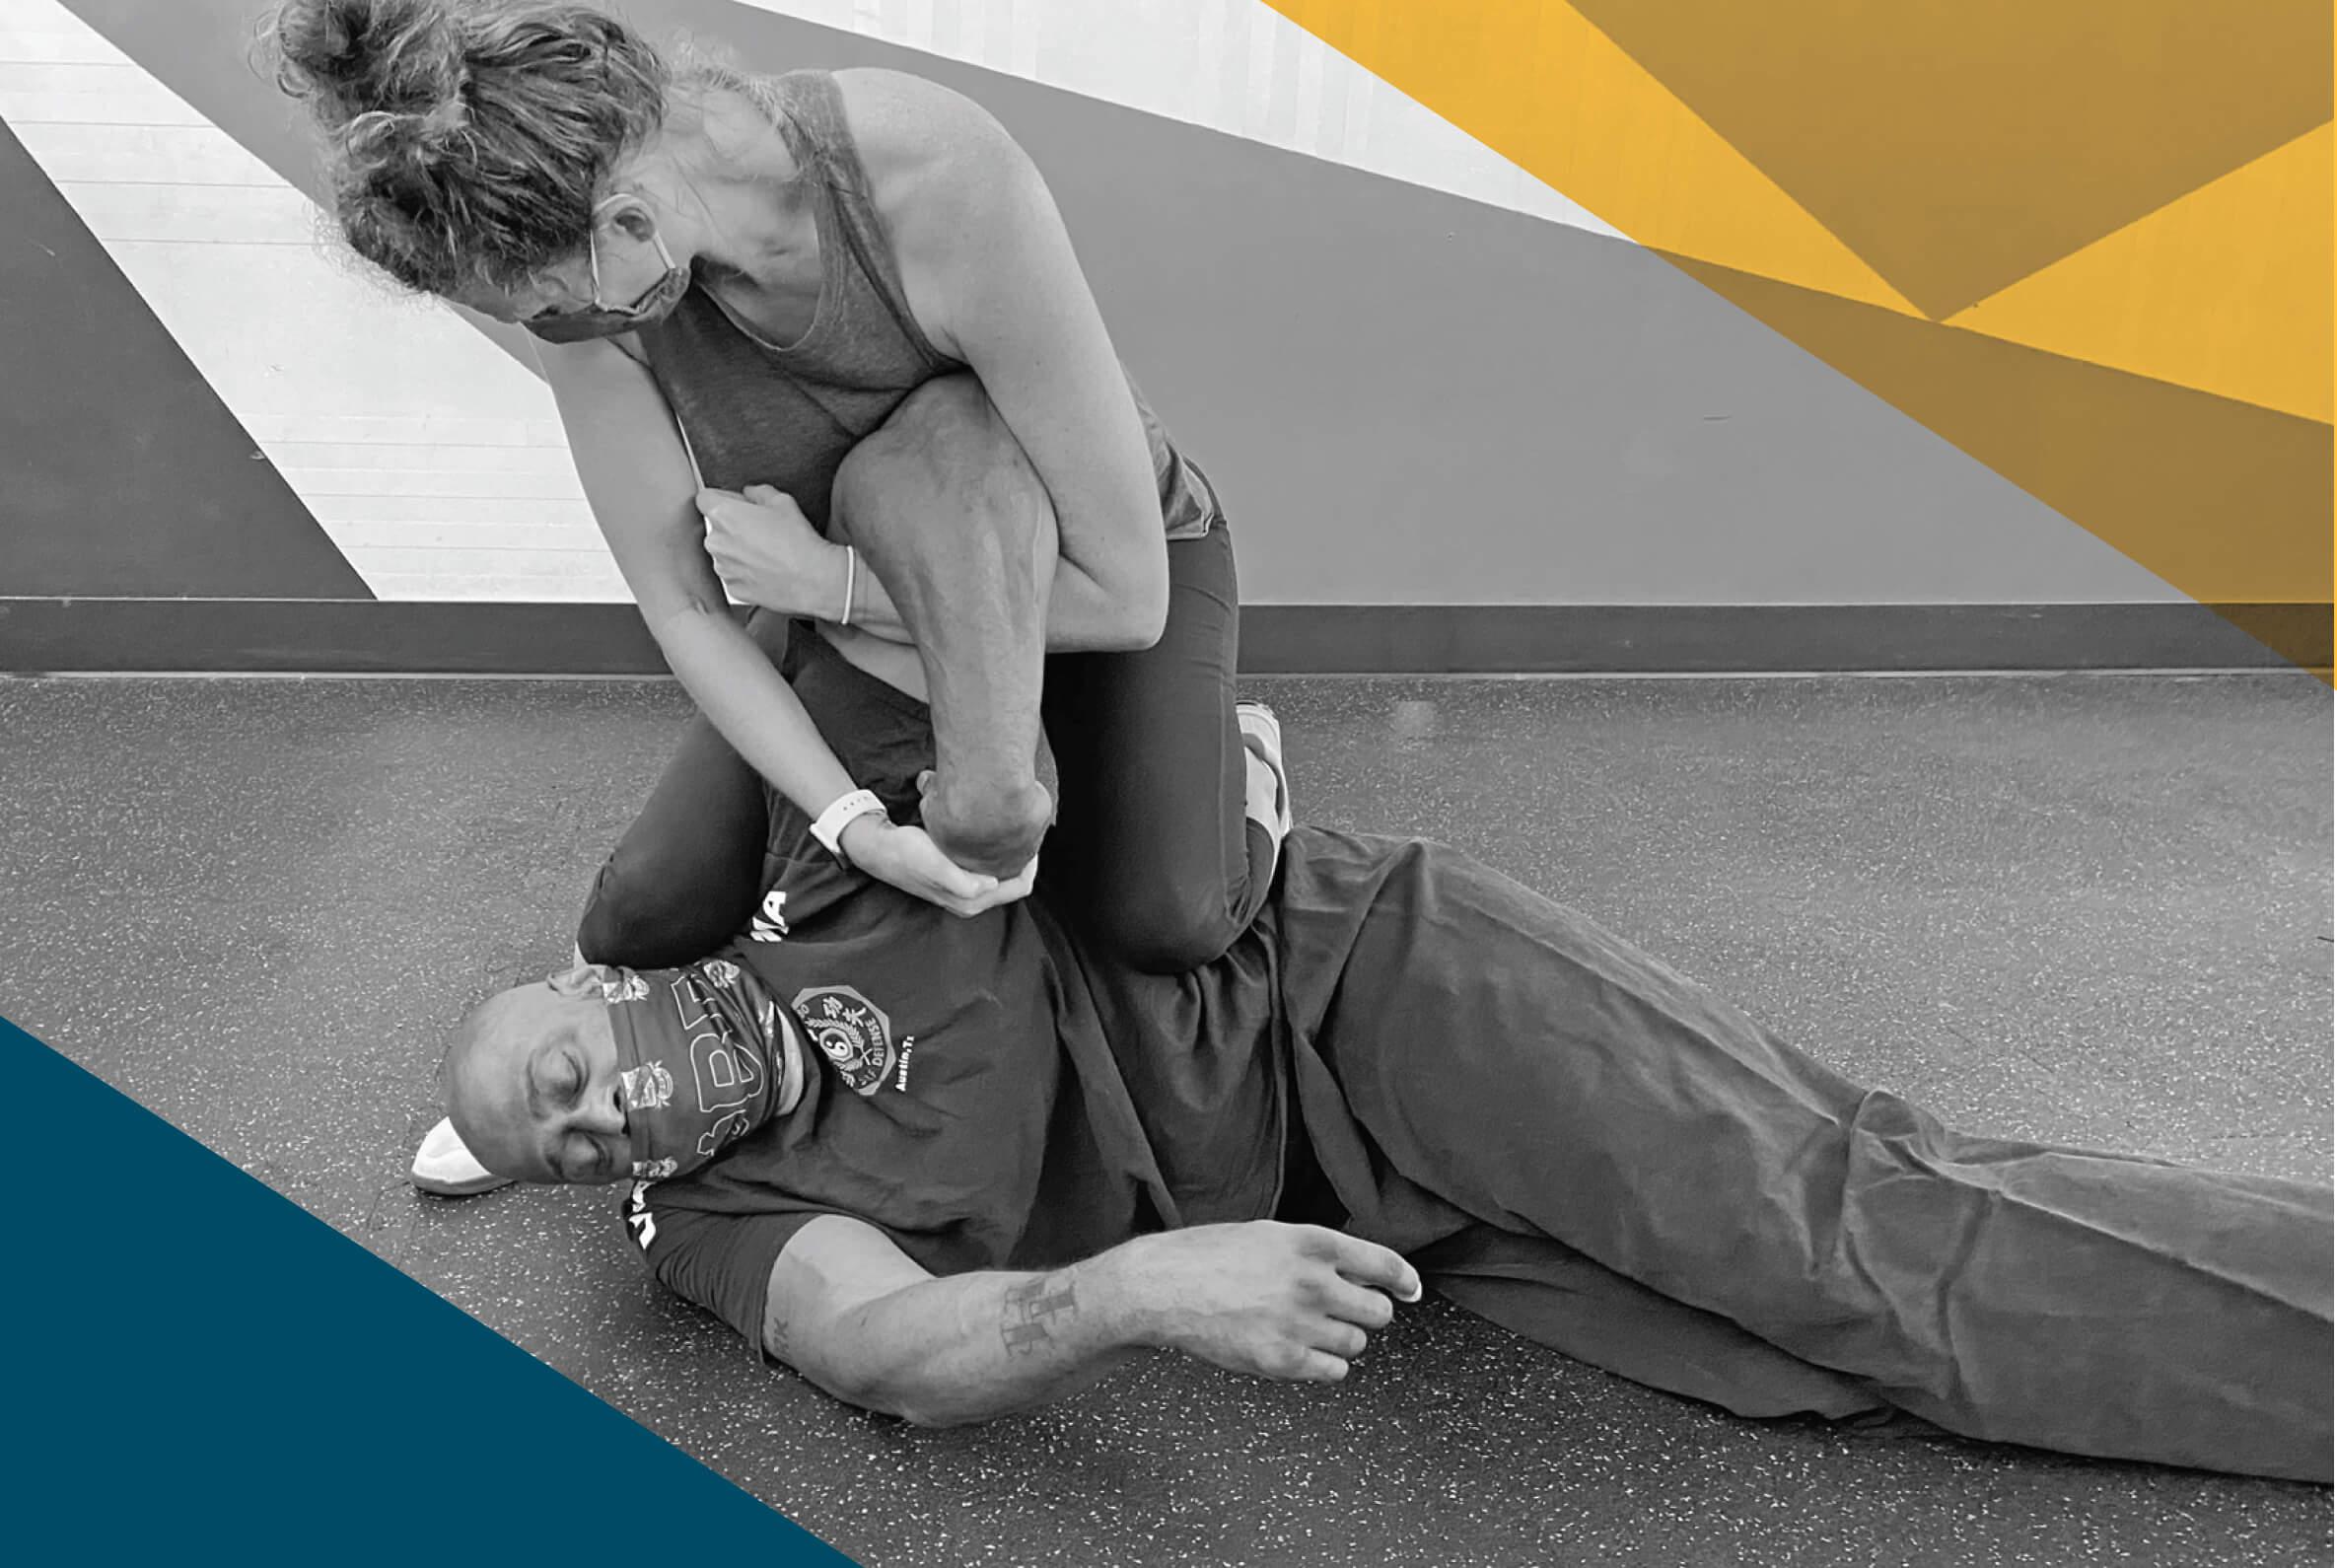 Self-Defense for Women Workshop